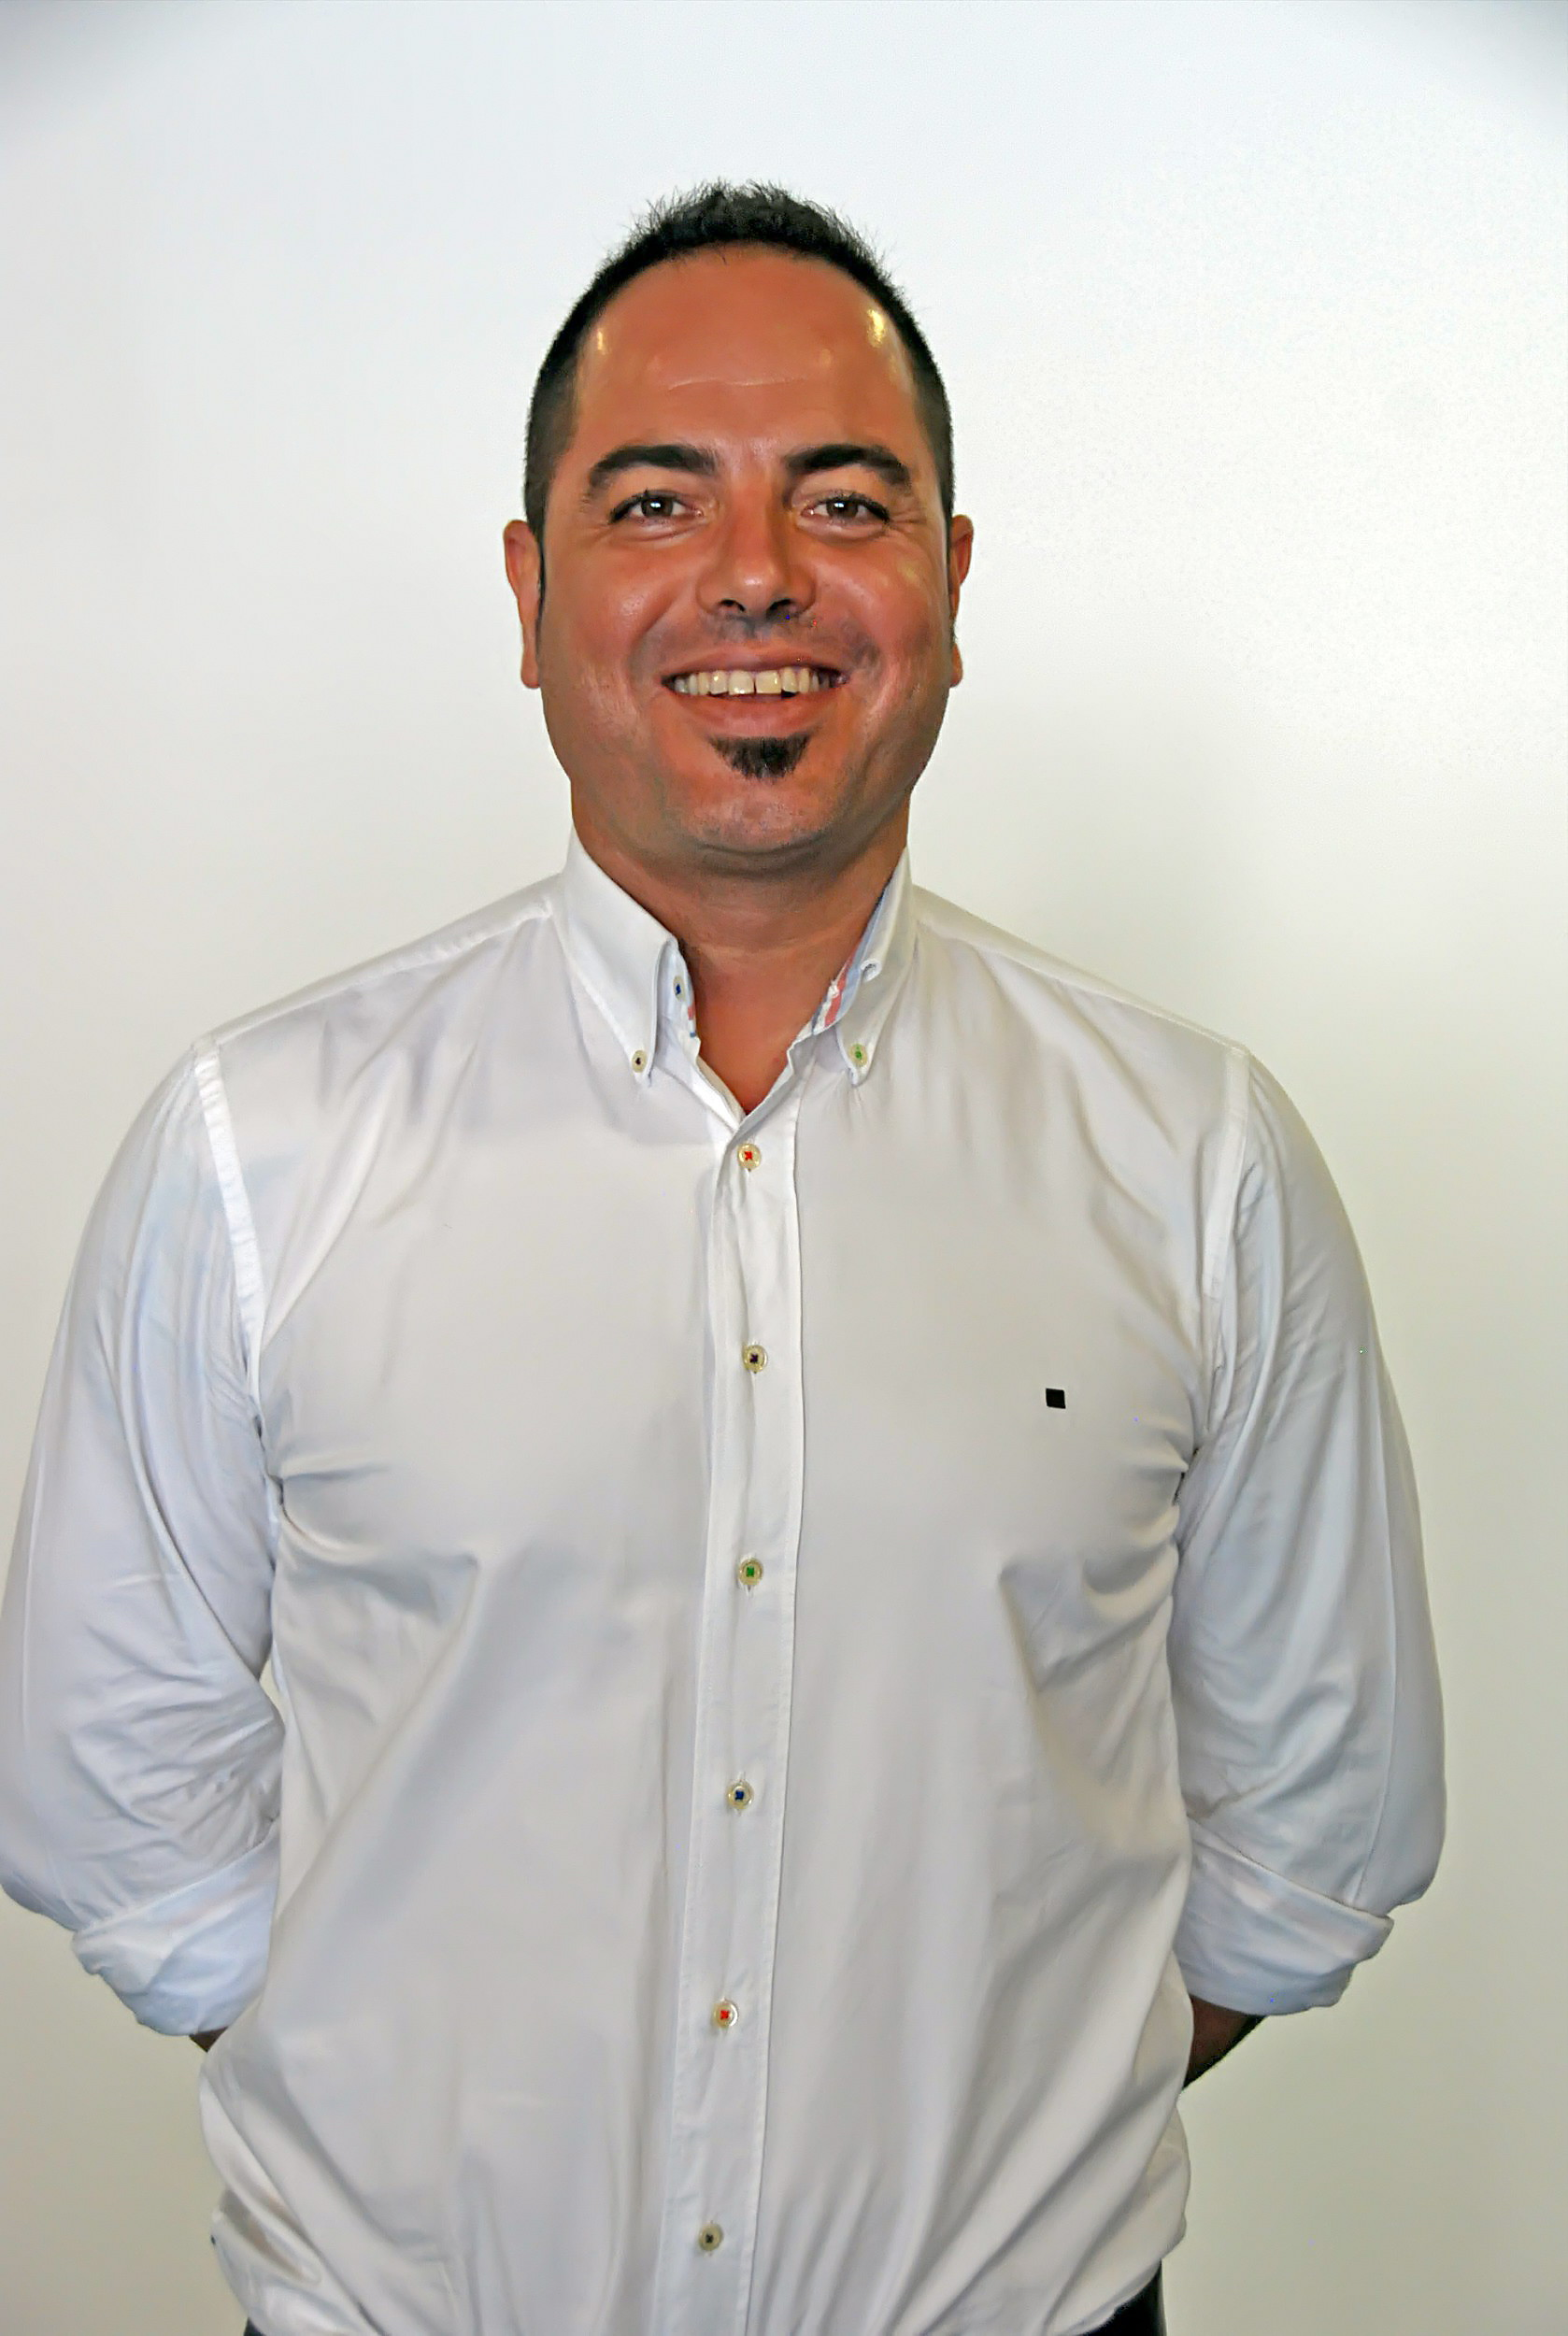 Ramón Alzórriz Goñi